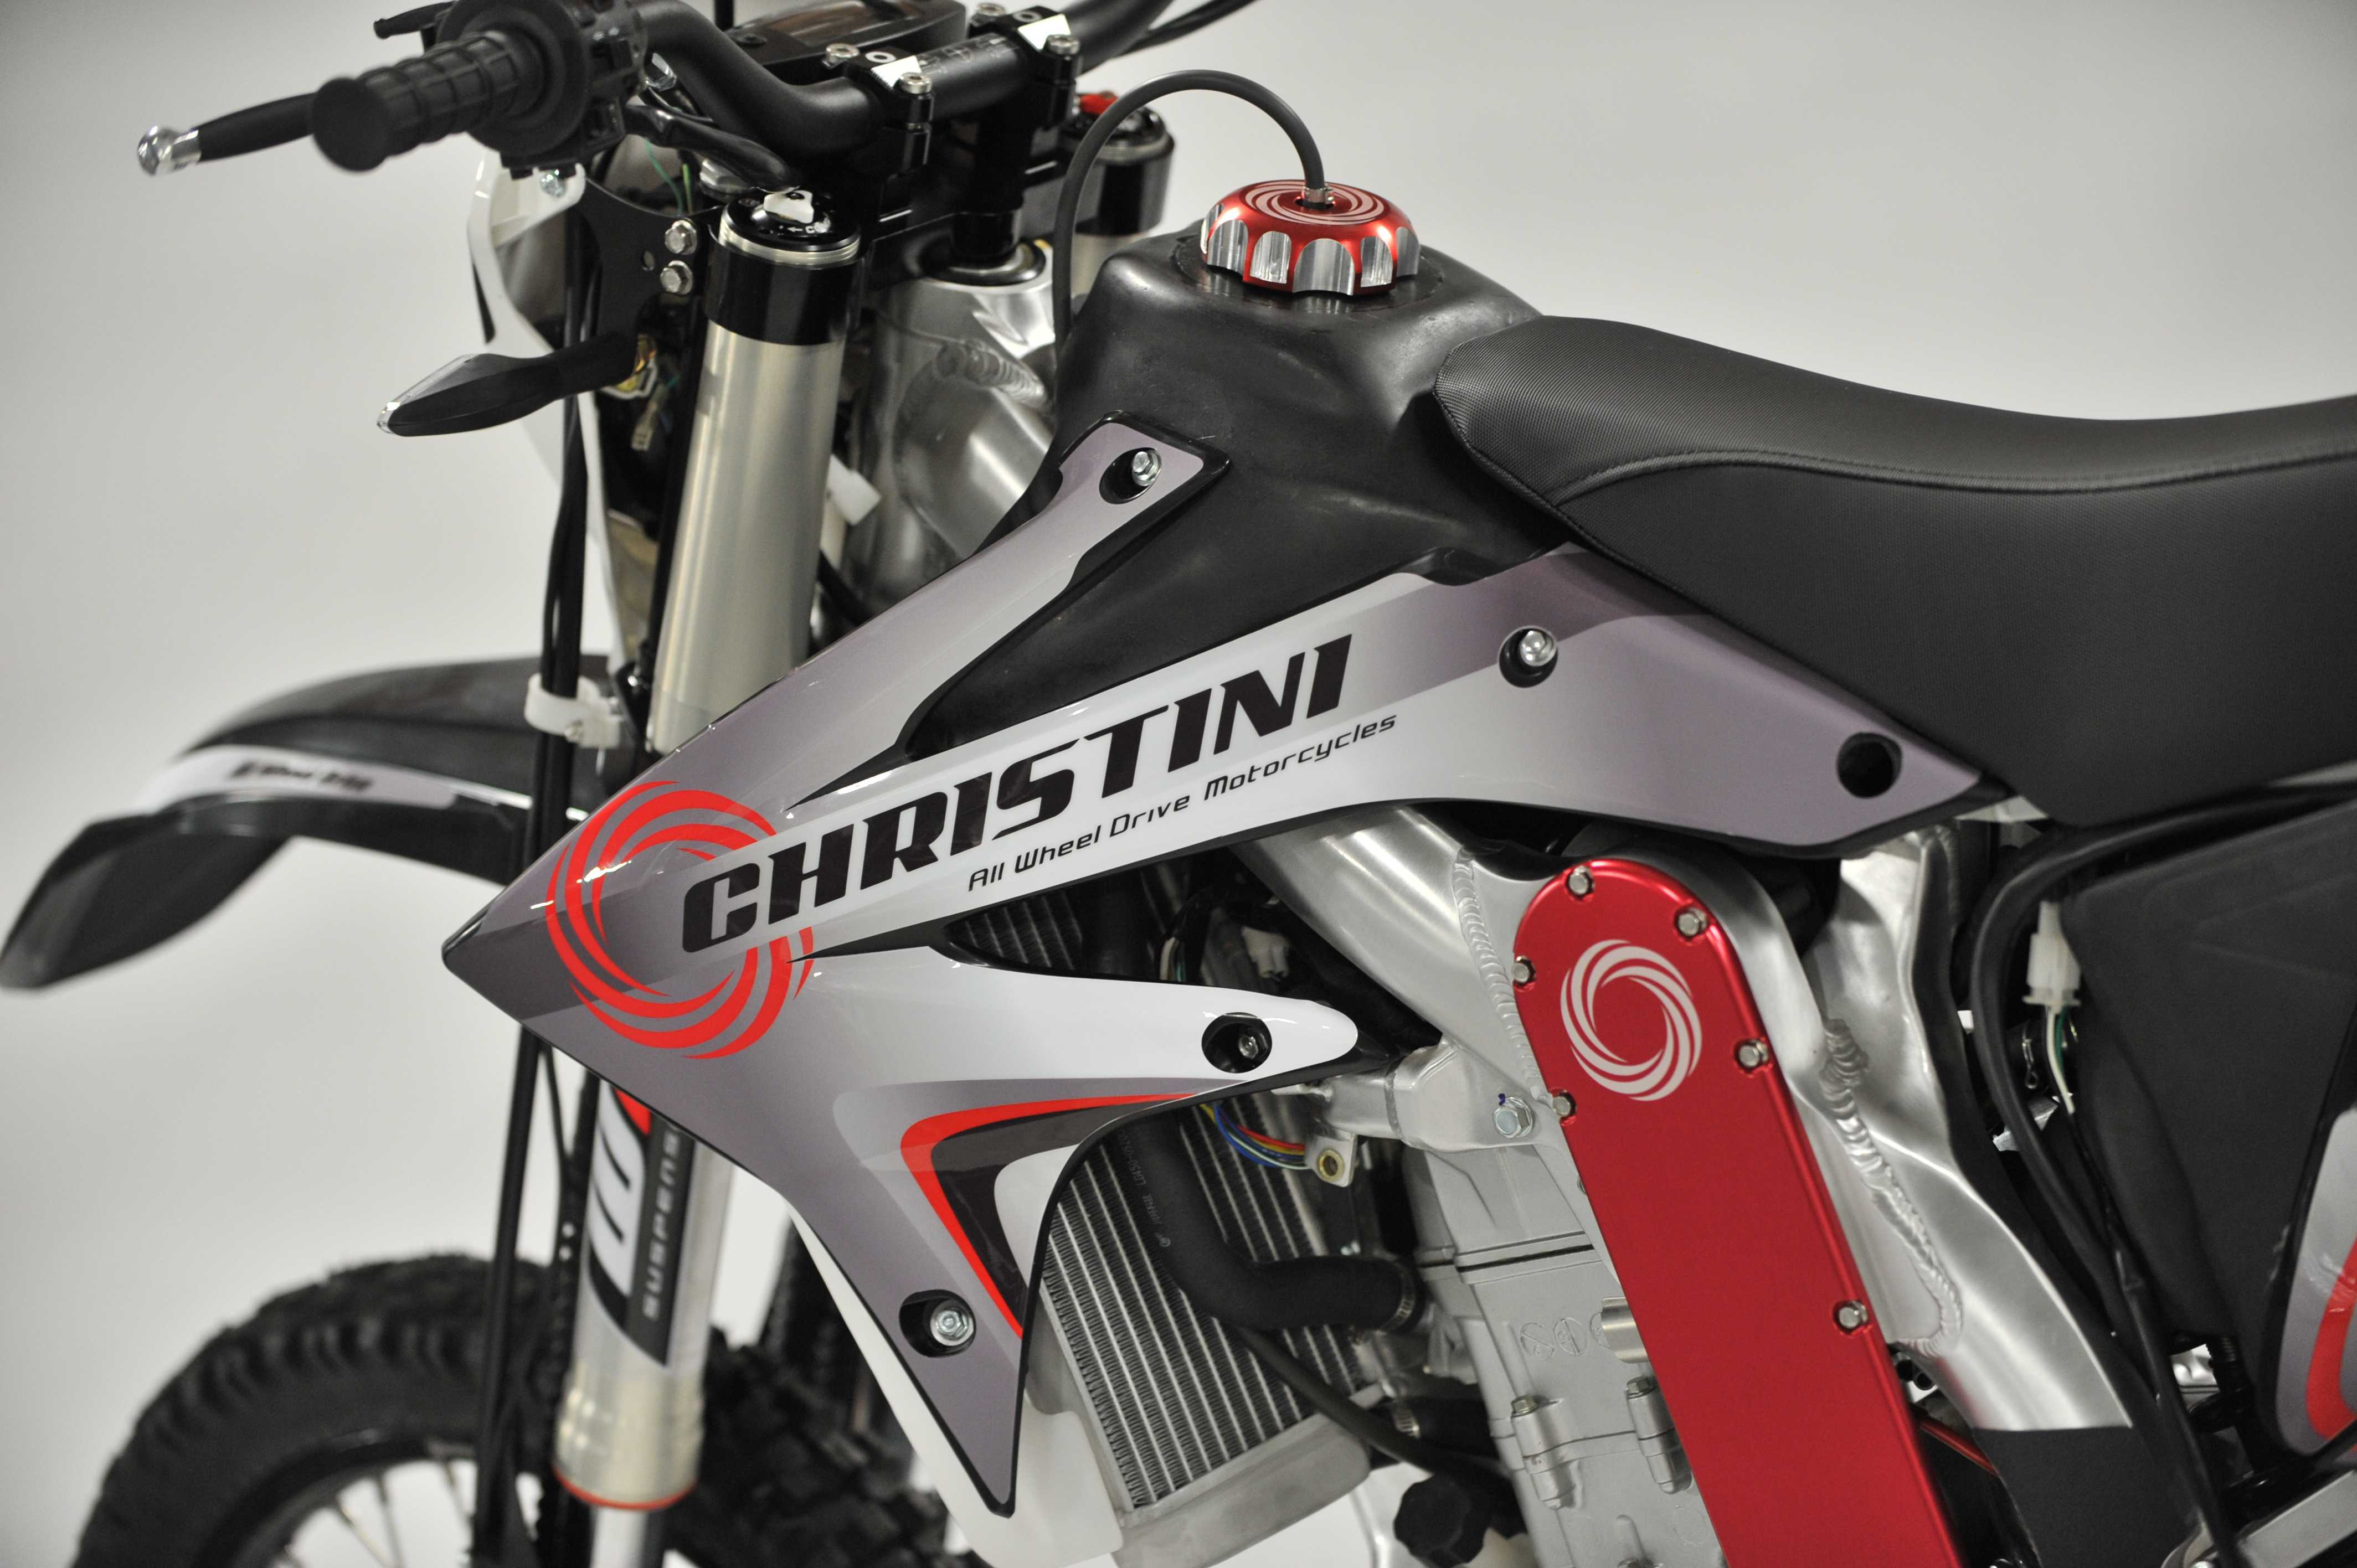 Christini AWD 450 Explorer - Christini All Wheel Drive